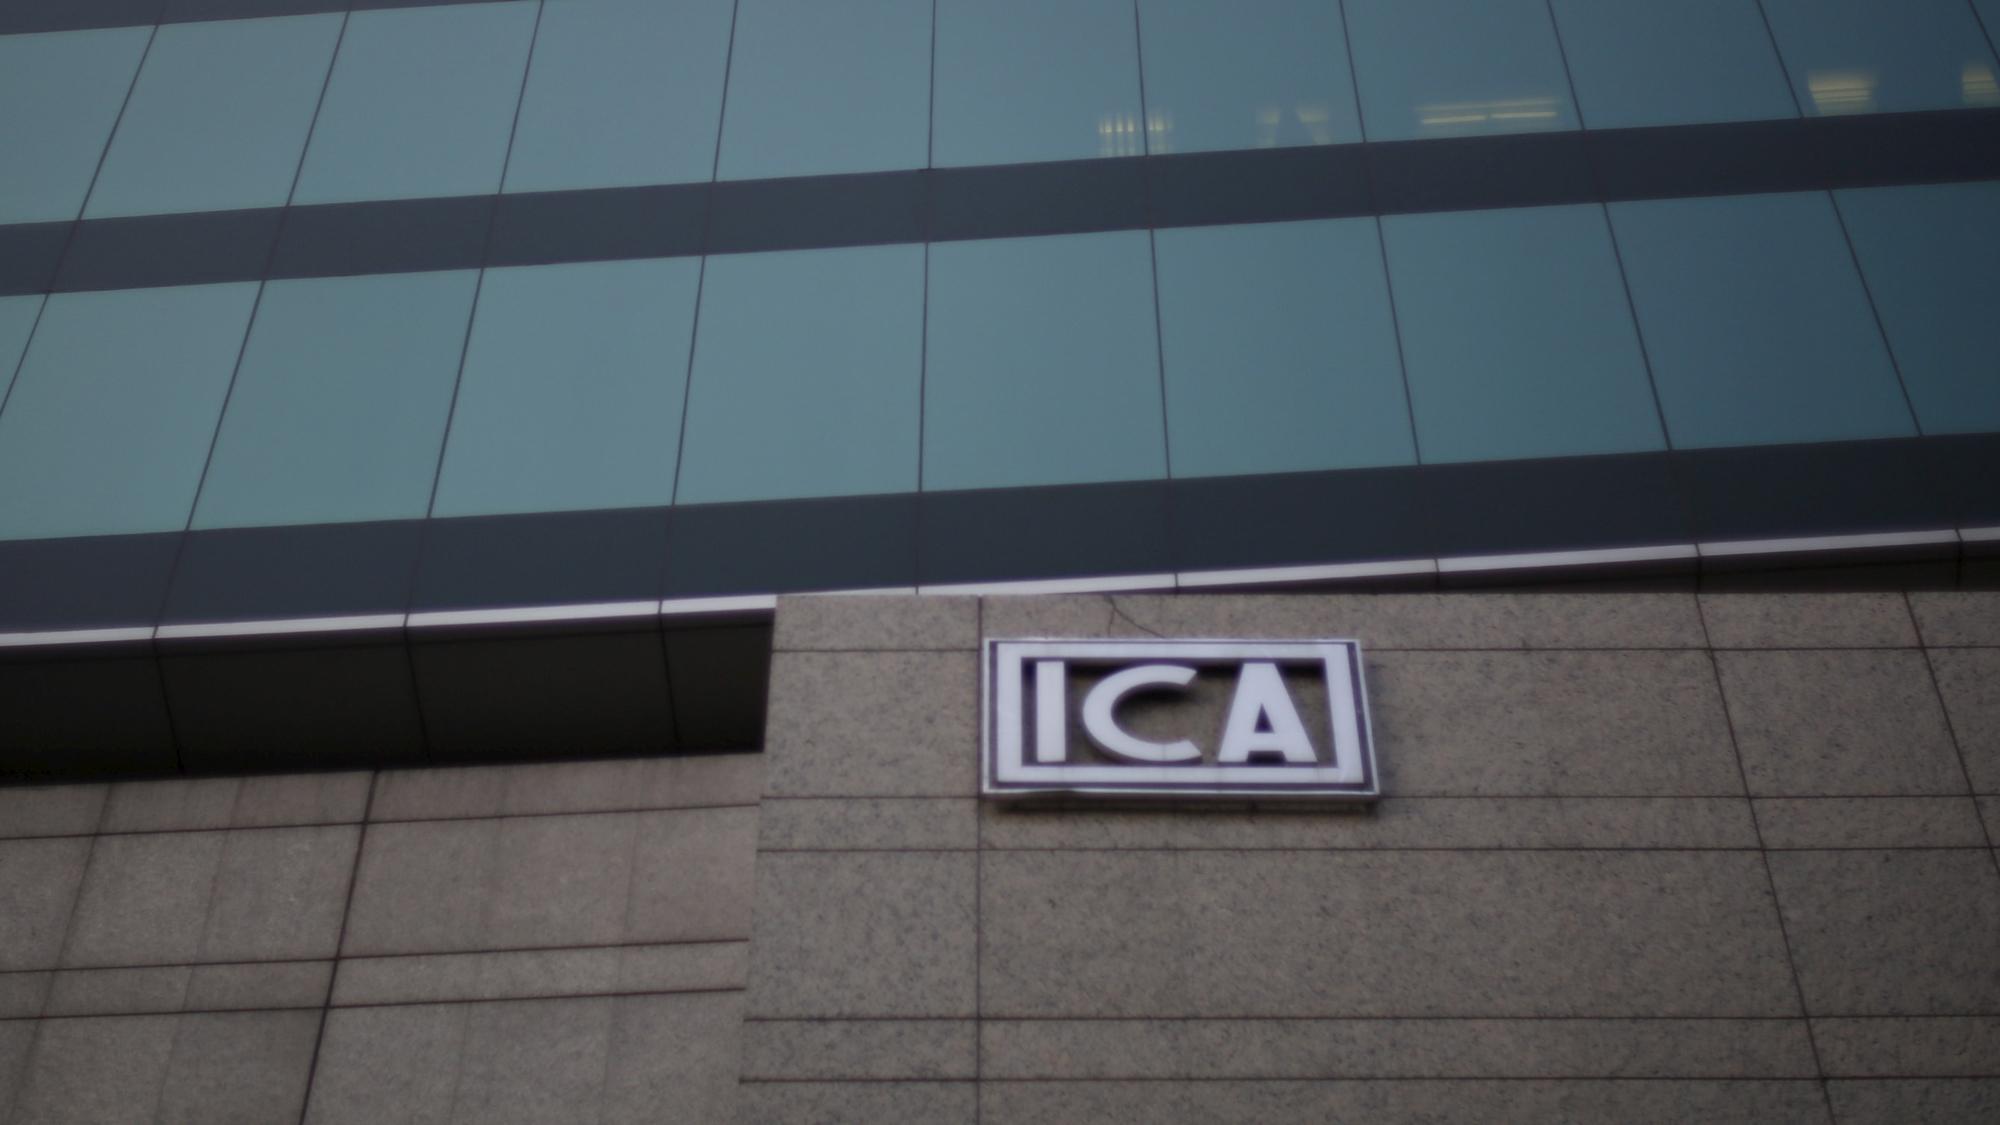 ICA deja concurso mercantil tras aval a reestructura de deuda